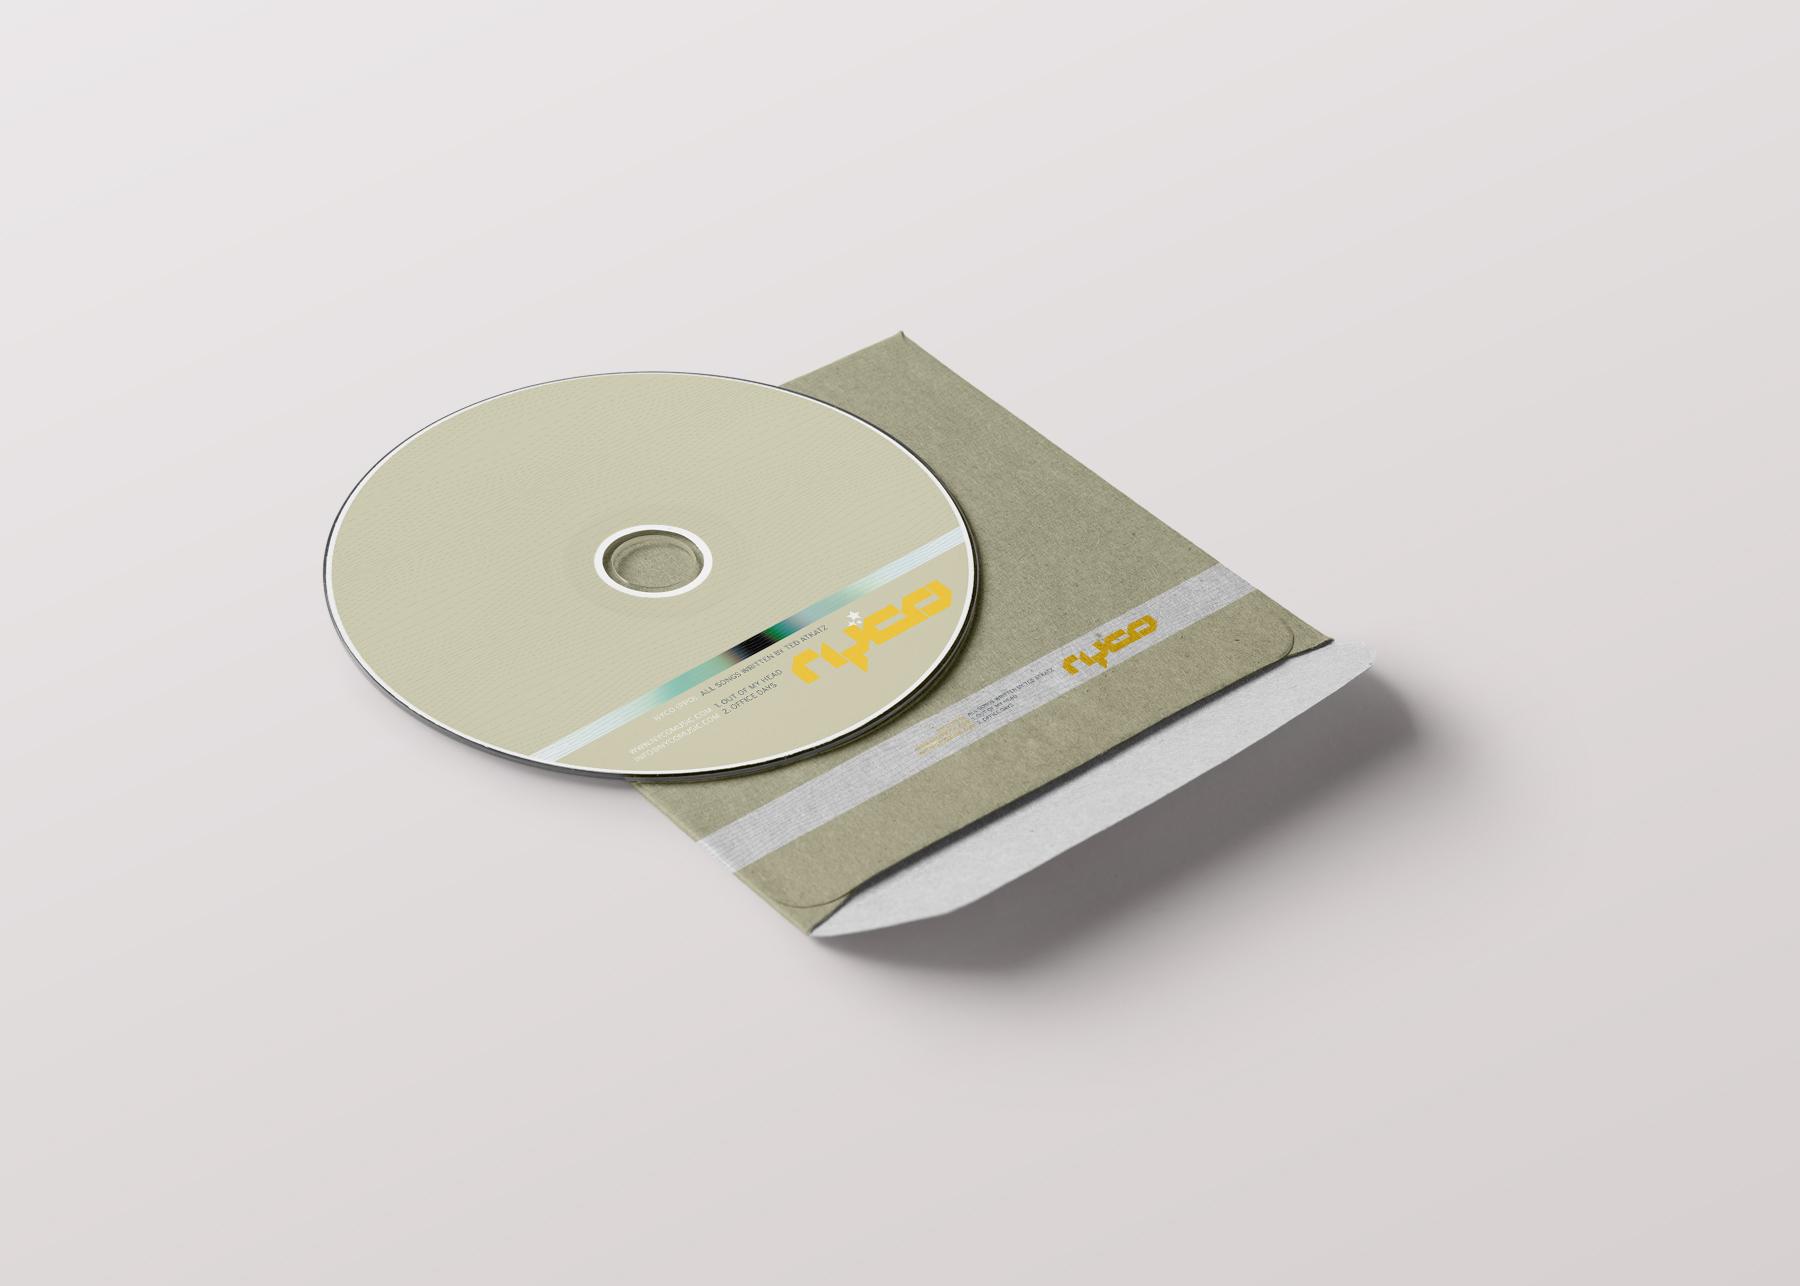 3D_nyco_demo2_case-disc.jpg